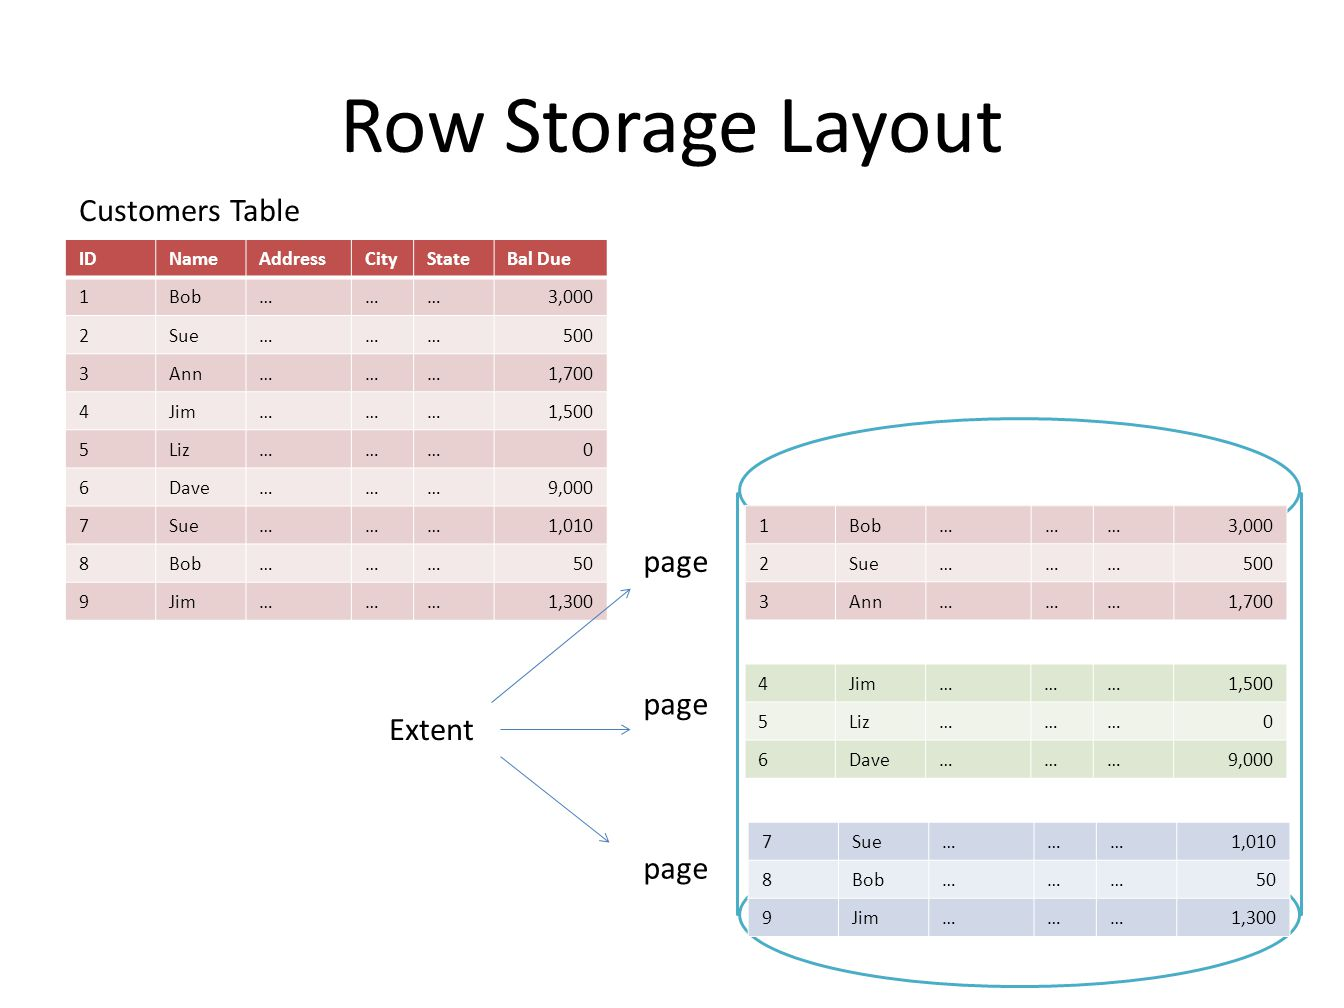 Row Storage Layout IDNameAddressCityStateBal Due 1Bob………3,000 2Sue………500 3Ann………1,700 4Jim………1,500 5Liz………0 6Dave………9,000 7Sue………1,010 8Bob………50 9Jim………1,300 1Bob………3,000 2Sue………500 3Ann………1,700 4Jim………1,500 5Liz………0 6Dave………9,000 7Sue………1,010 8Bob………50 9Jim………1,300 Customers Table page Extent